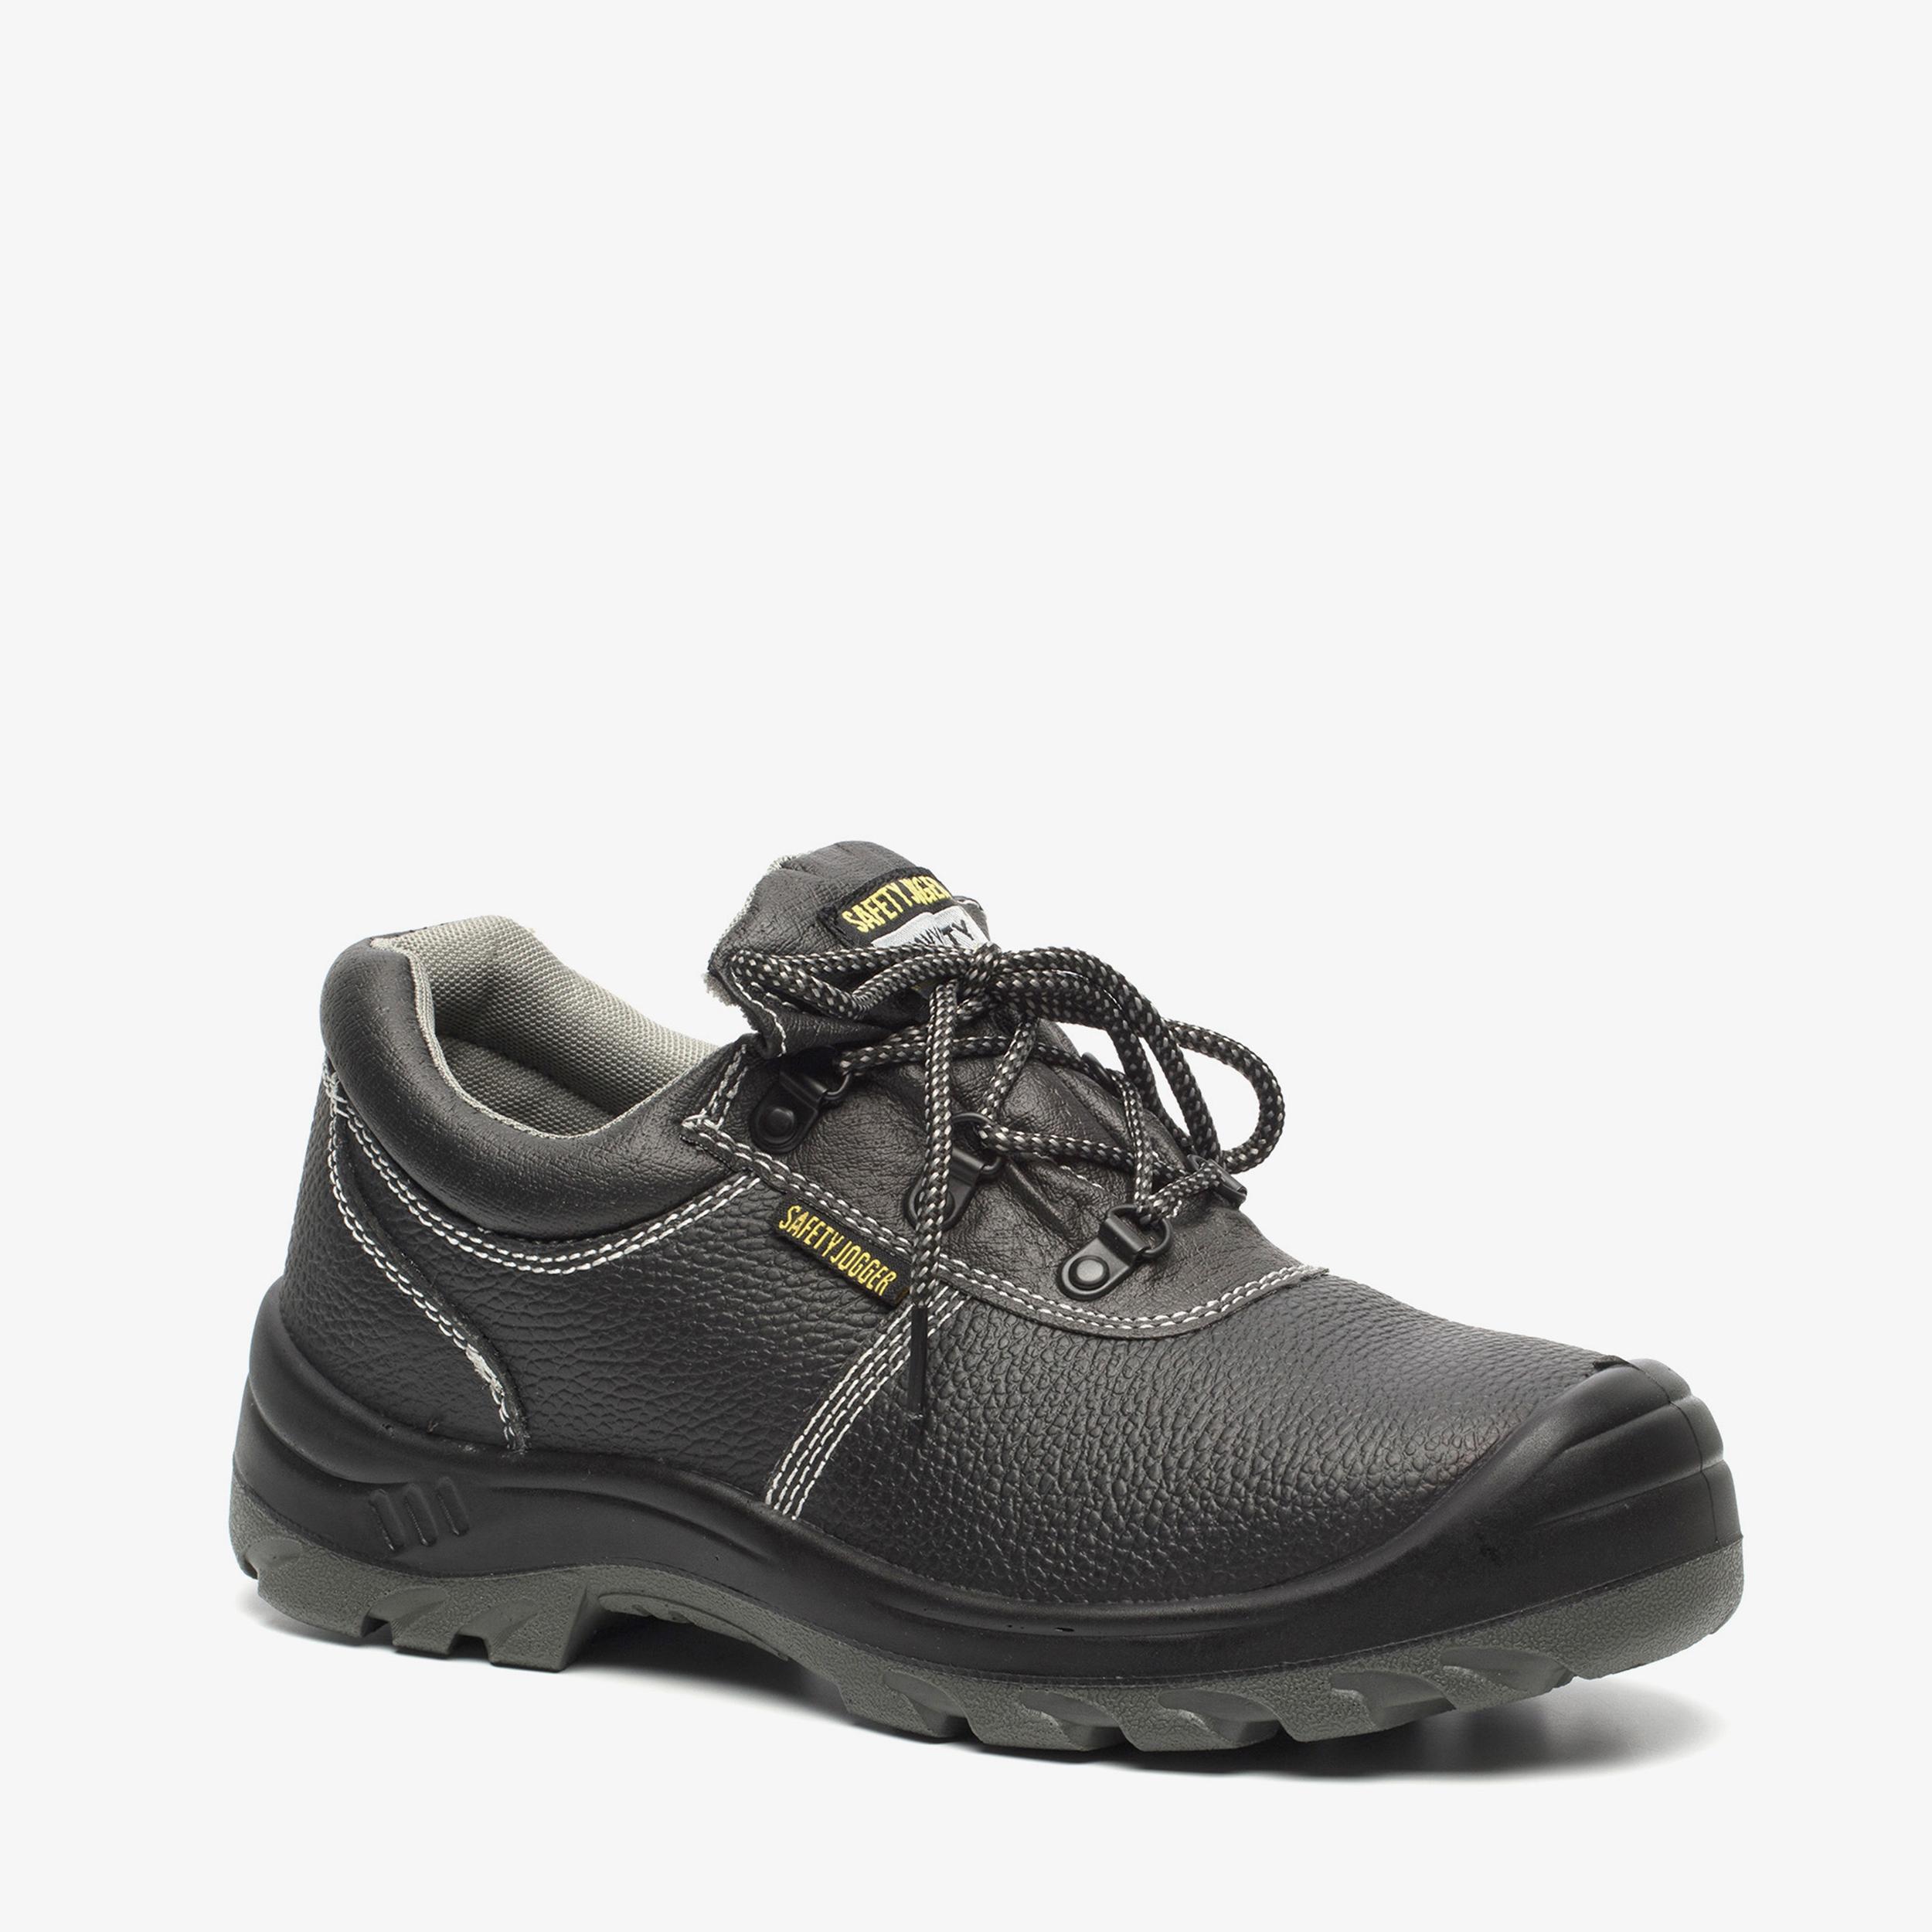 Safety Jogger Werkschoenen.Safety Jogger Bestrun Leren Werkschoenen Online Bestellen Scapino